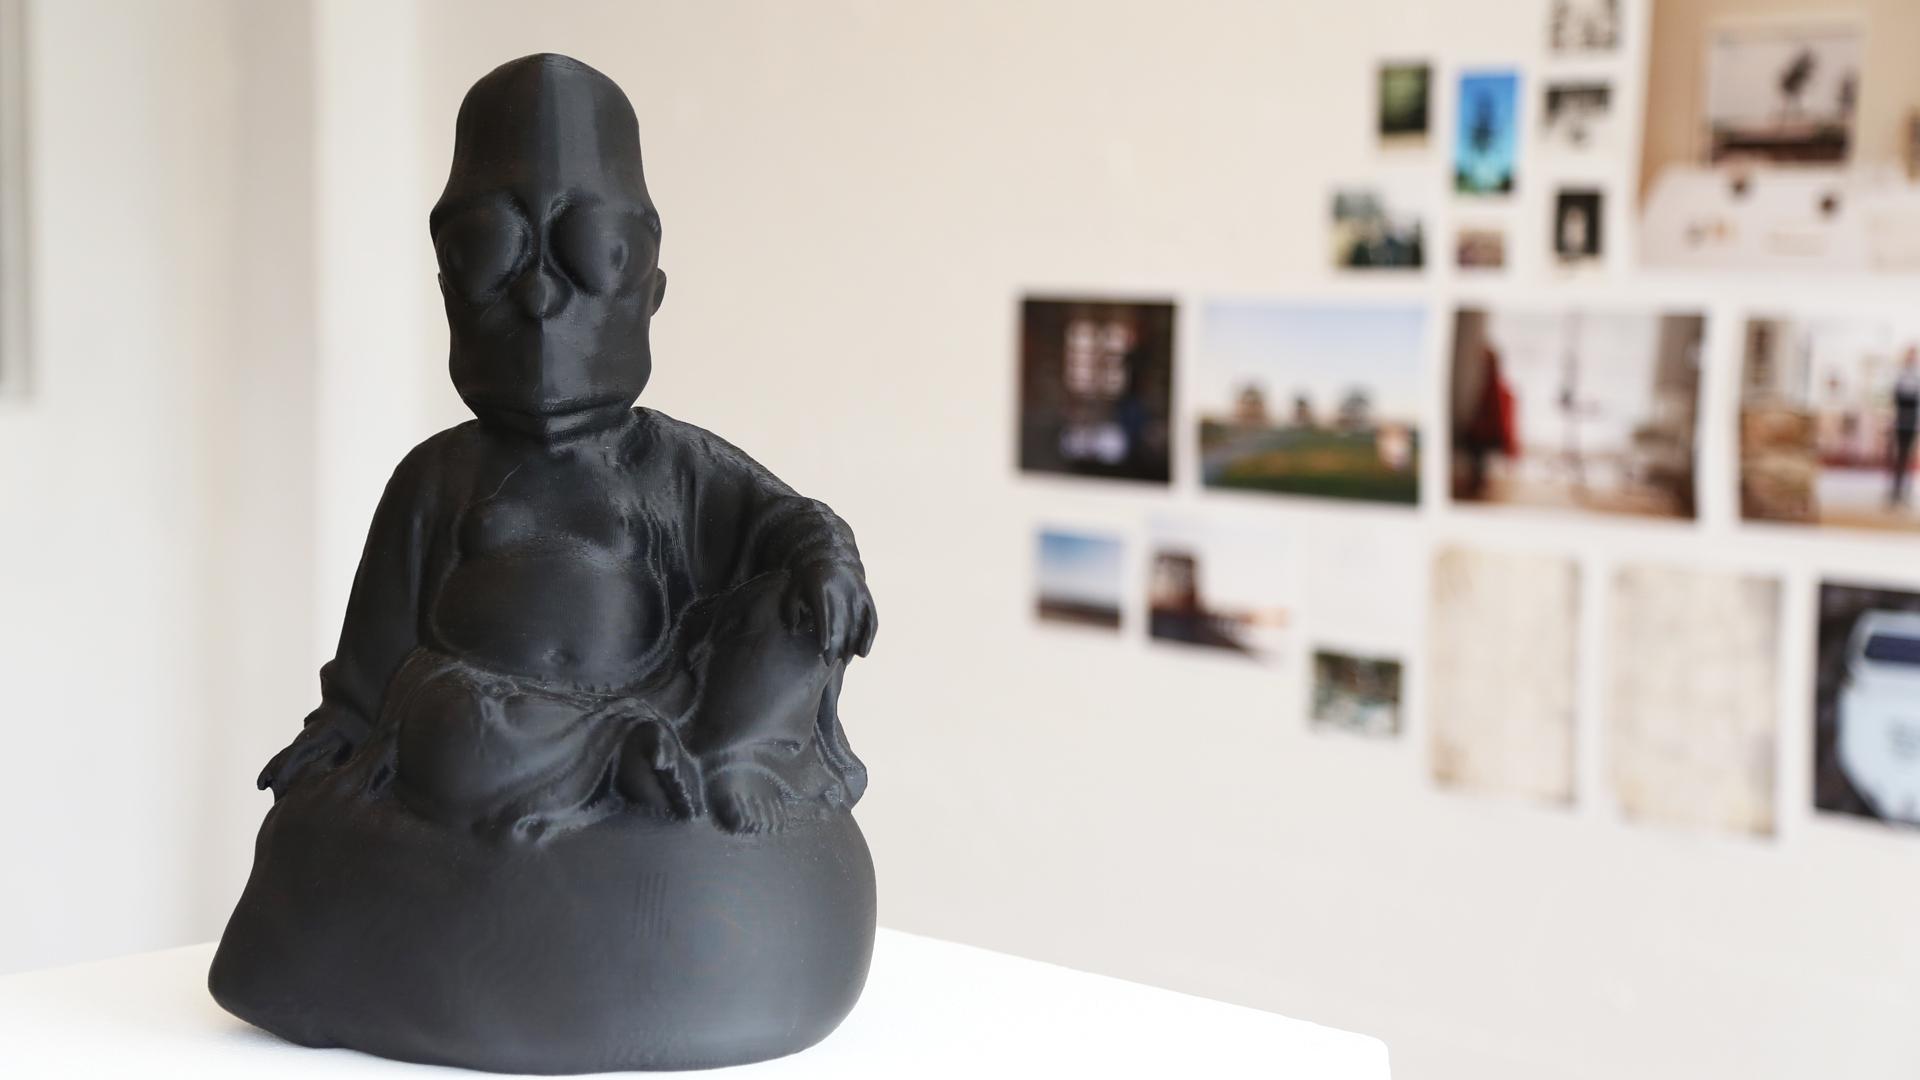 Dark Matter: #buddha #simpson, Morehshin Allahyari